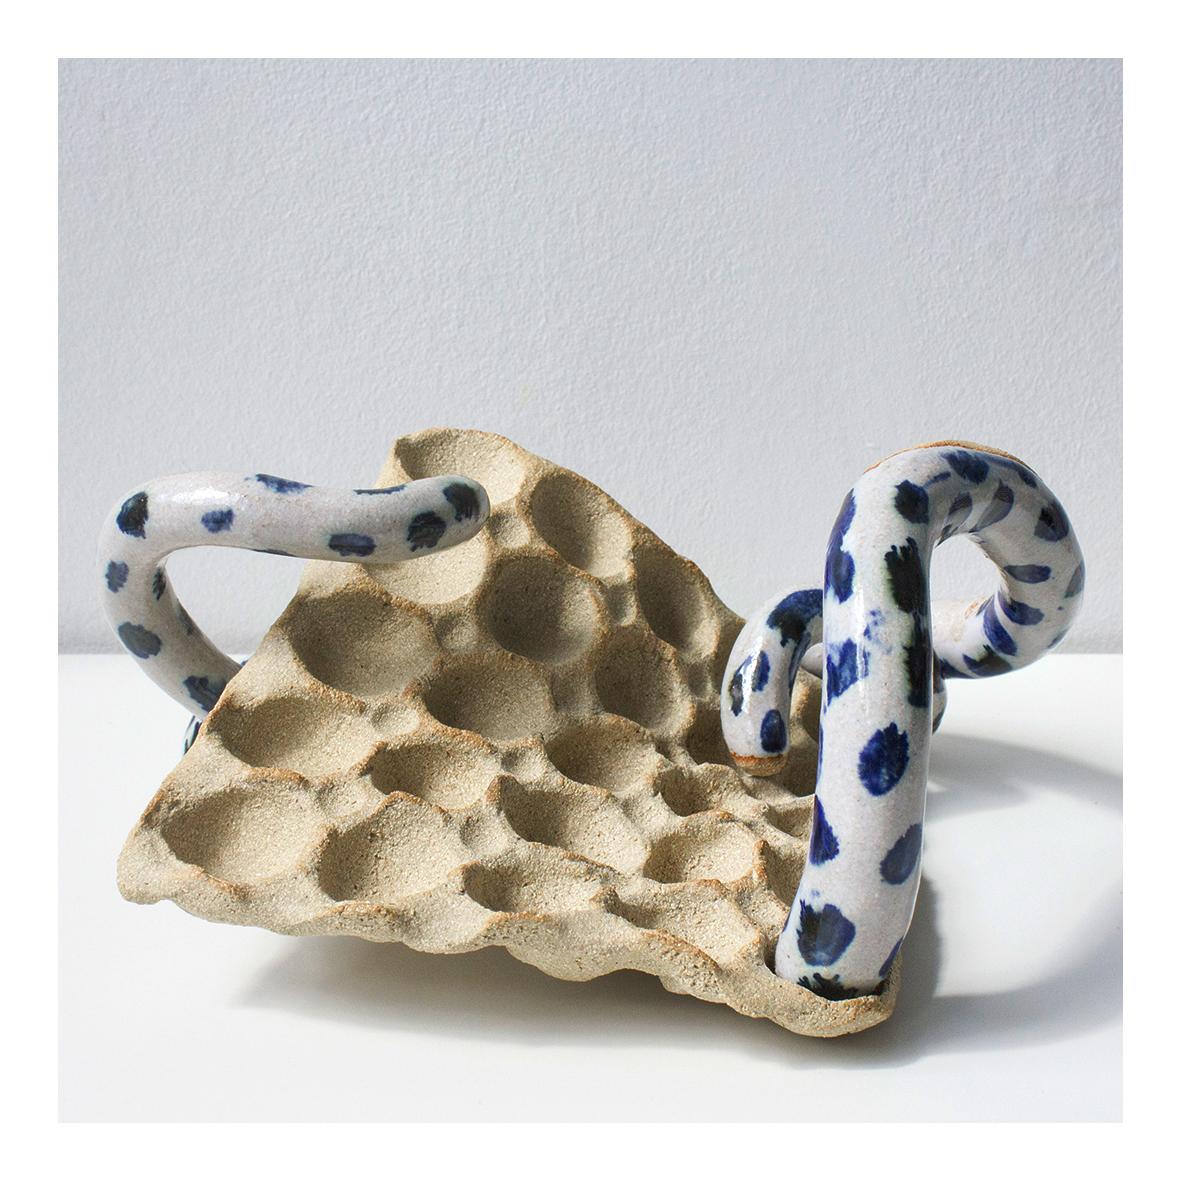 @veronika_neukirch Coral Connect 4 (2020) Glazed Stoneware 16 x 25 x 22cm